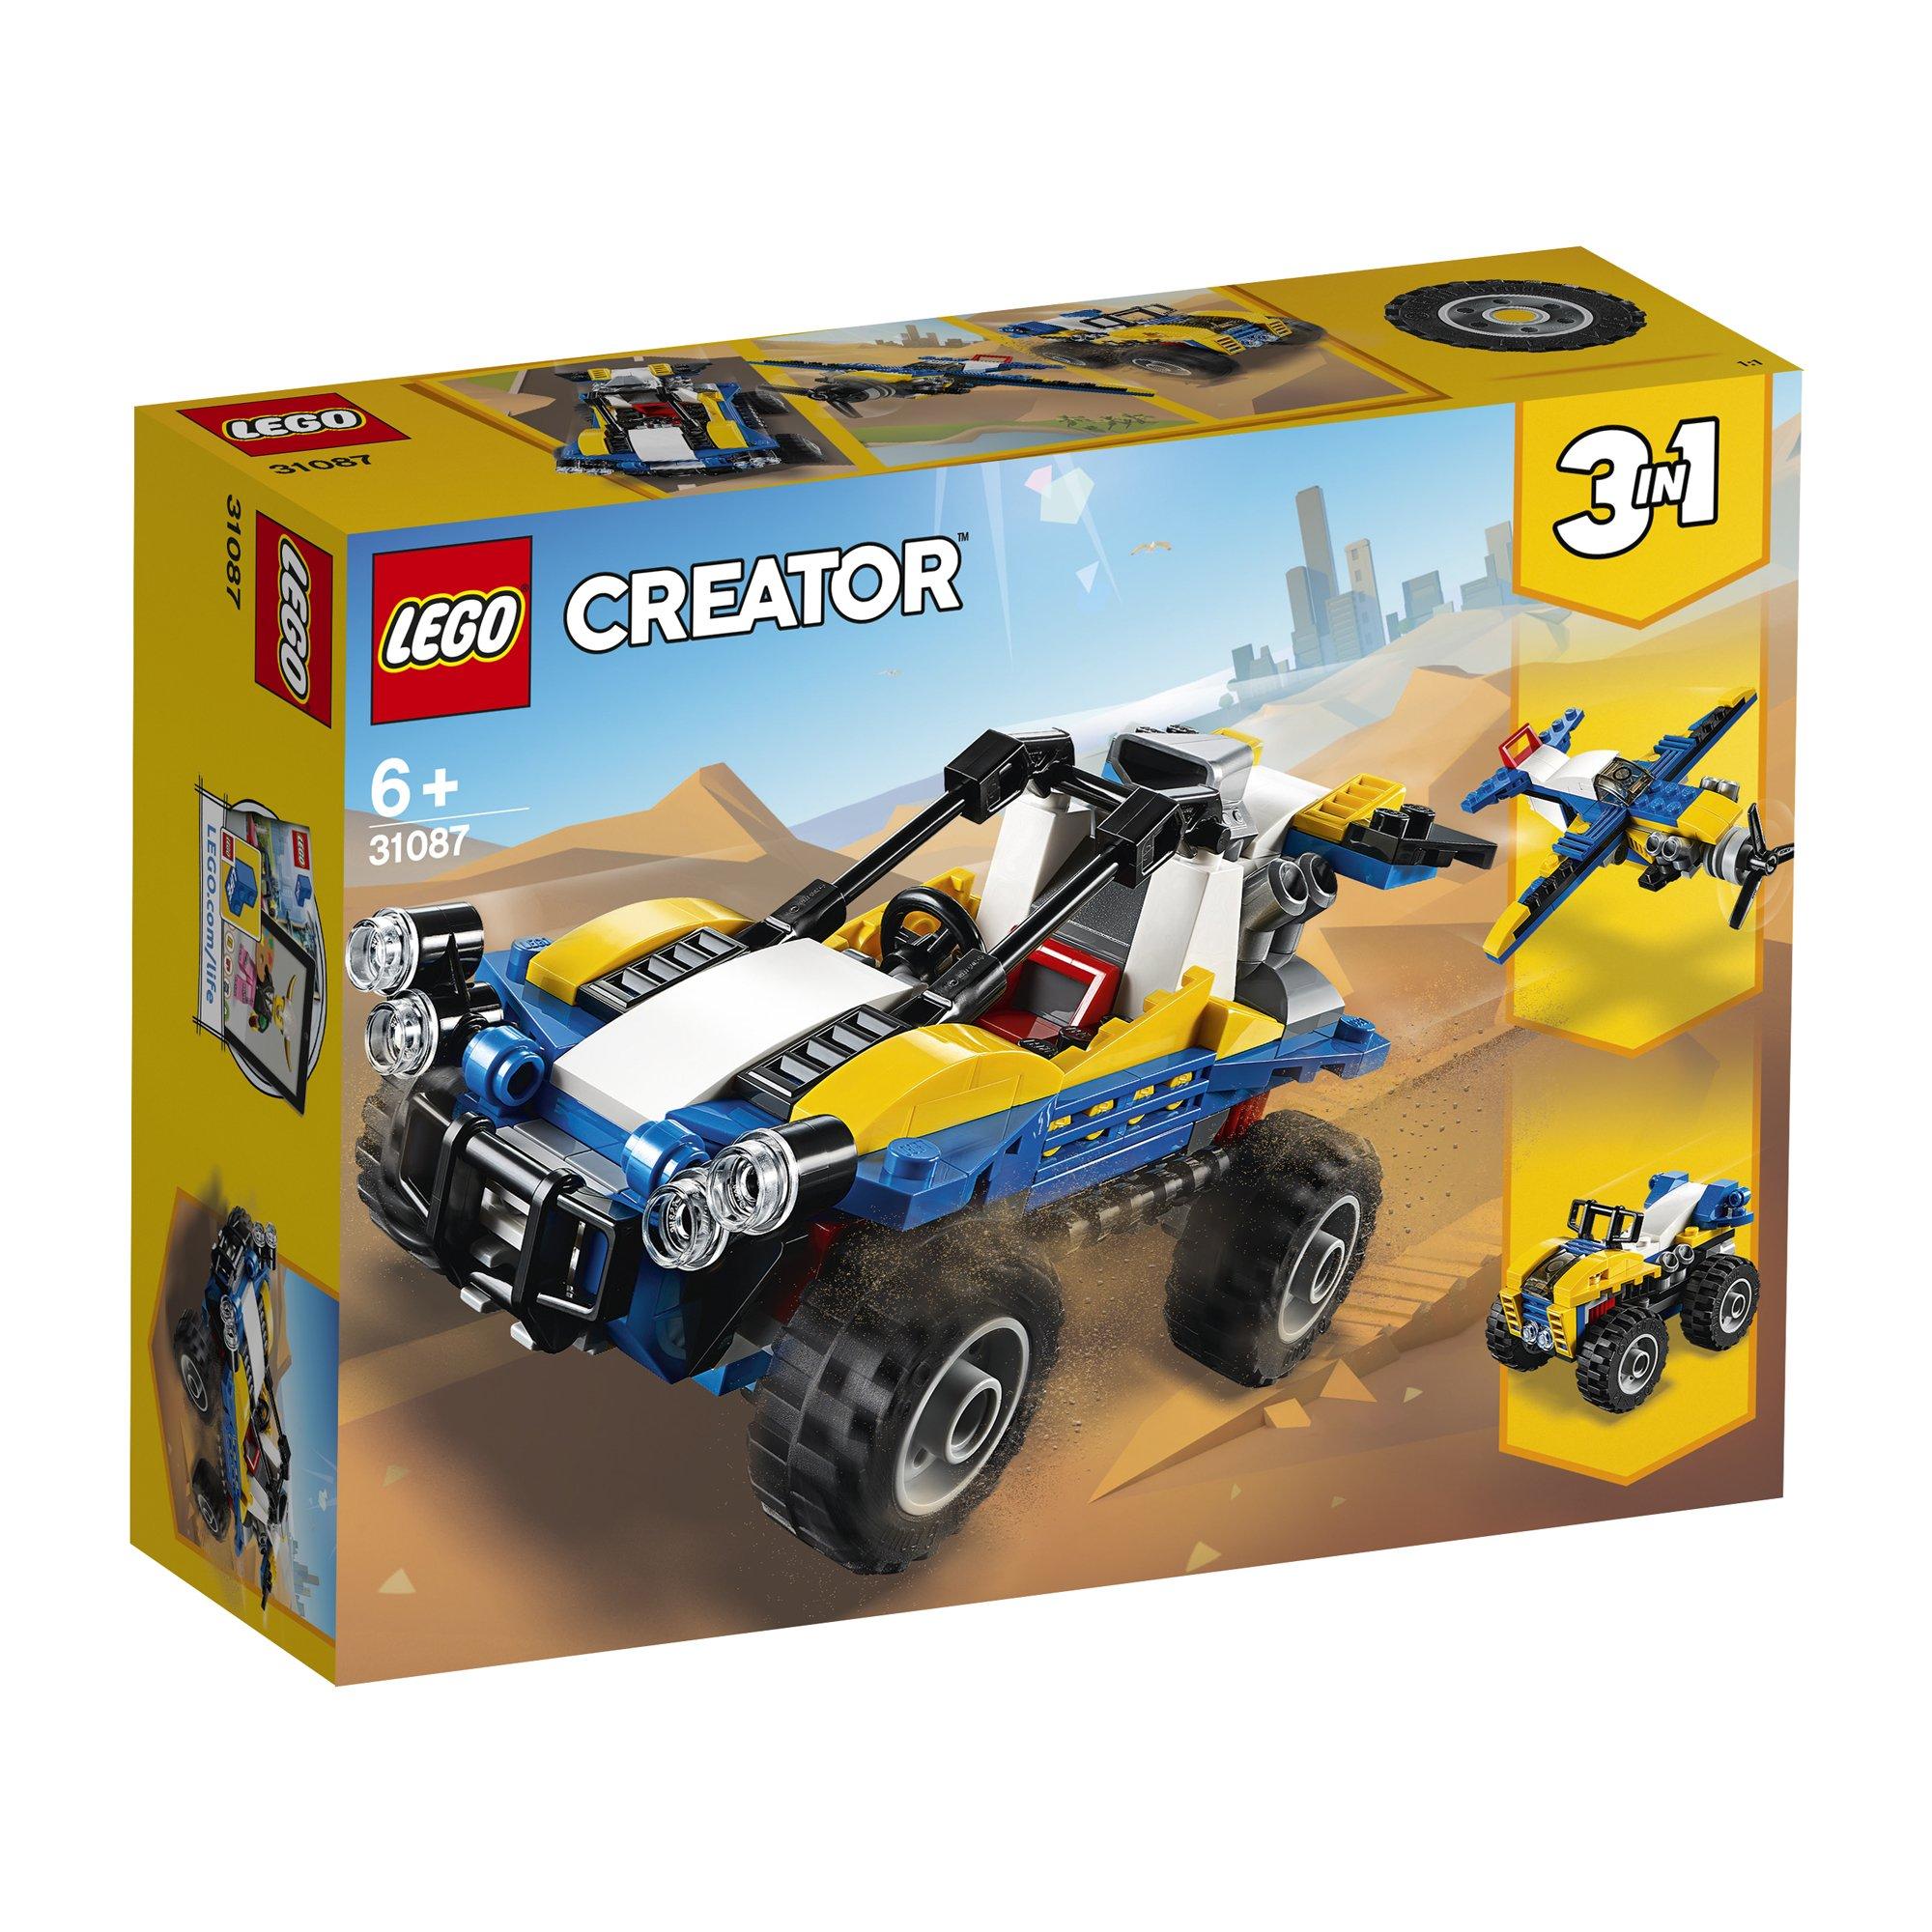 LEGO 樂高積木 Creator系列 31087 沙灘車